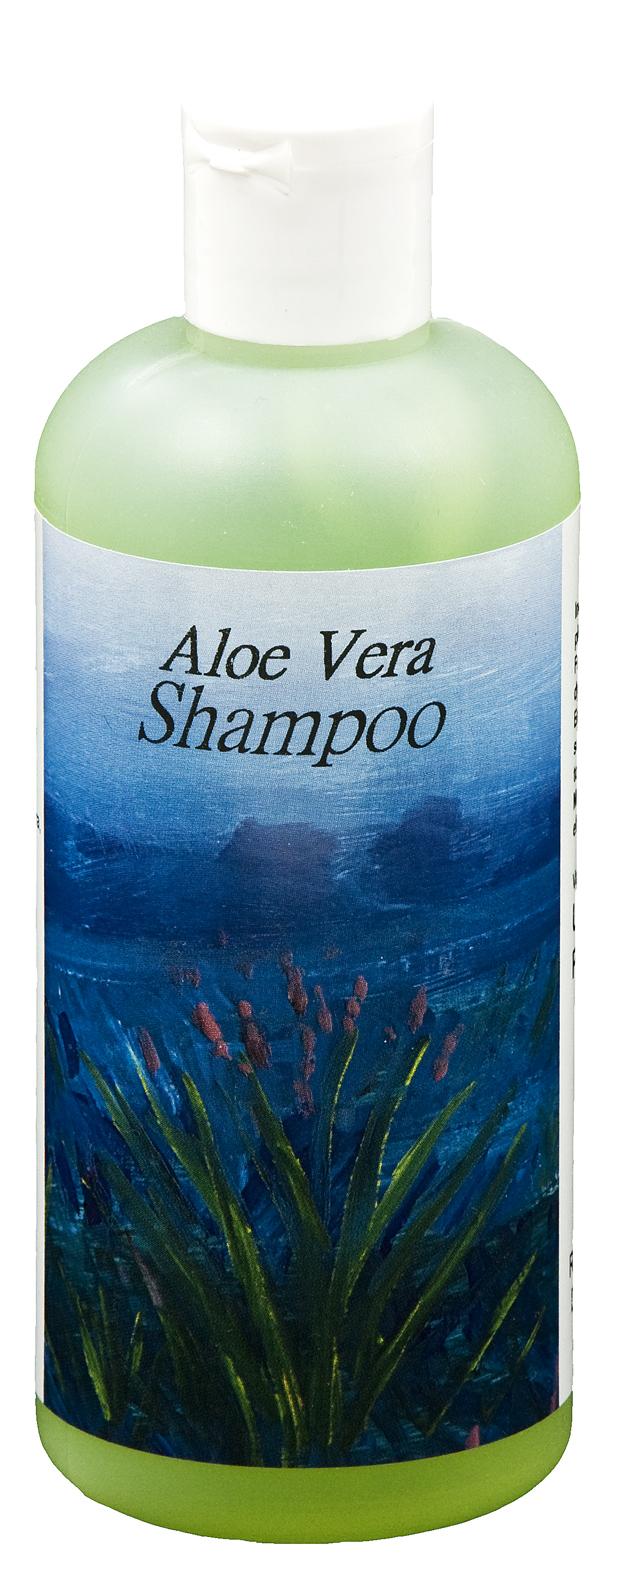 Image of Aloe Vera Shampoo 1 Liter.